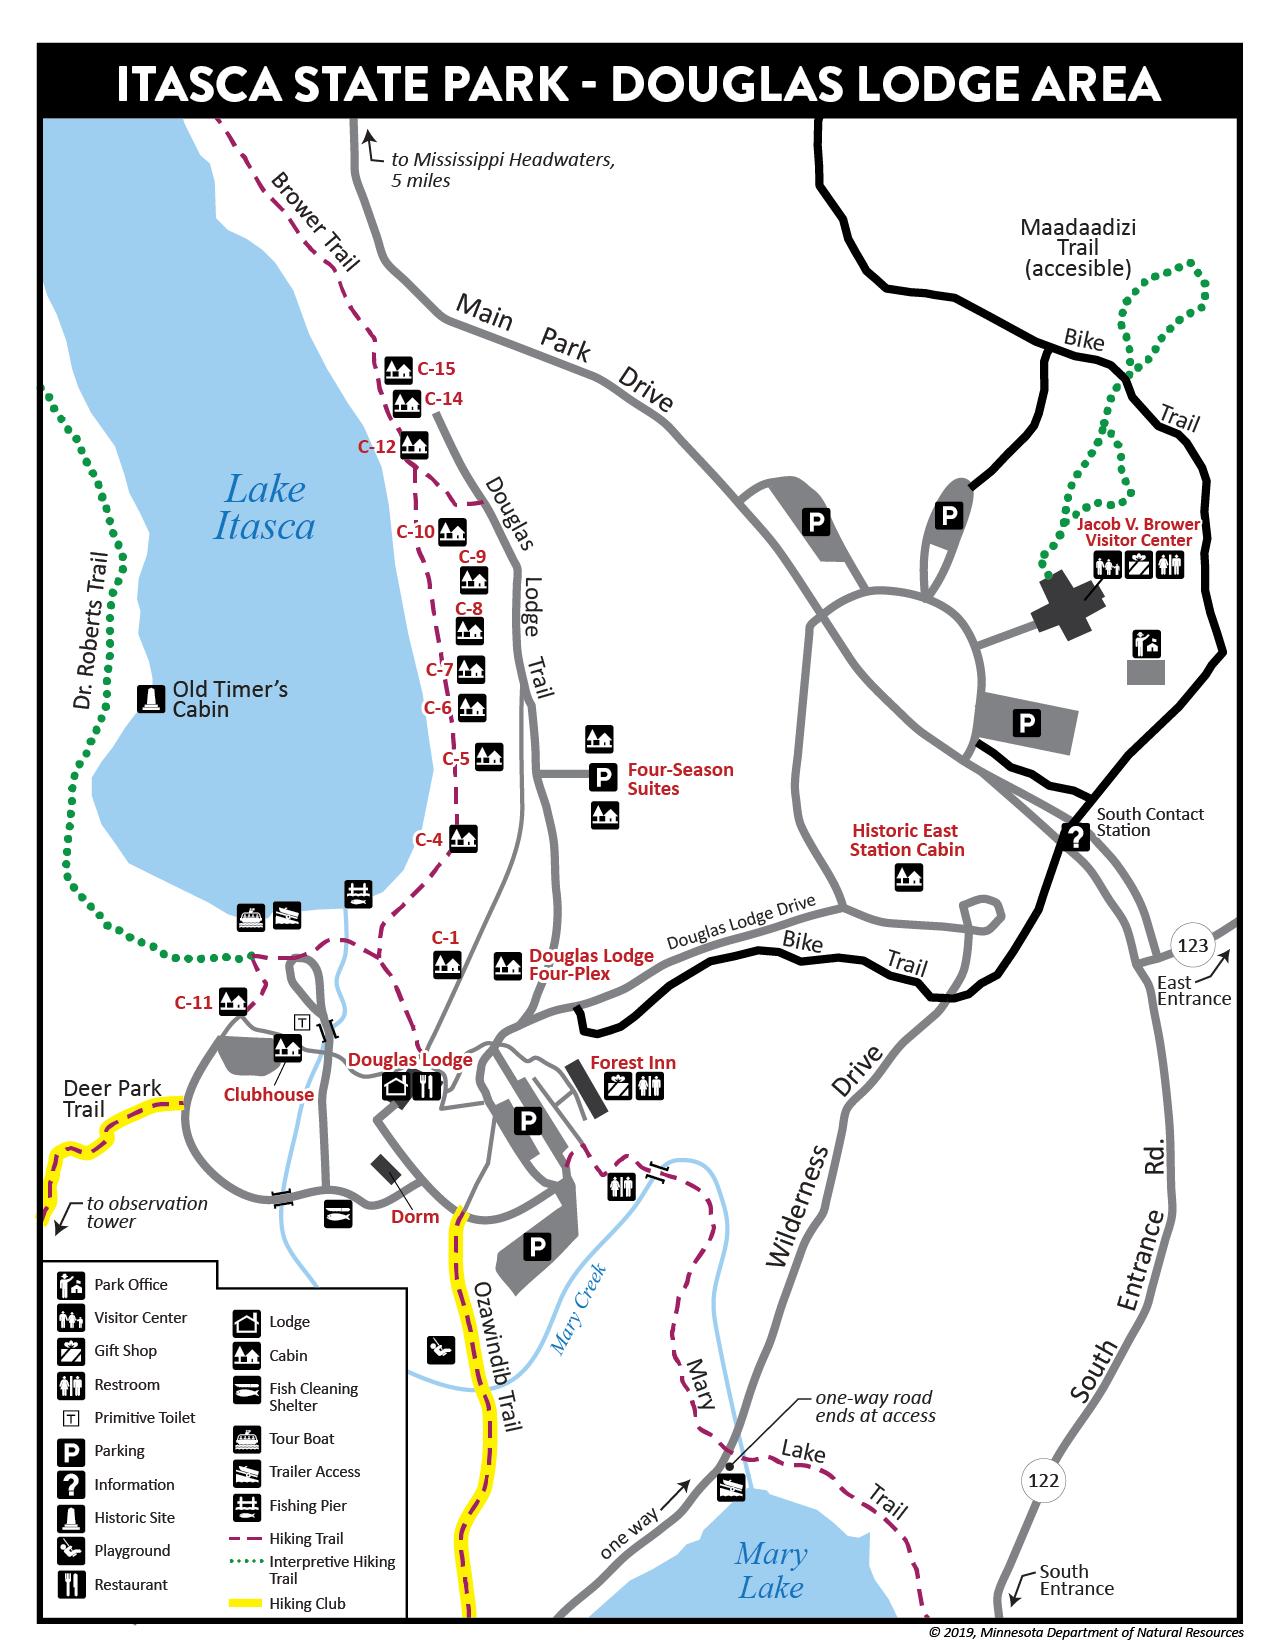 Douglas Lodge Map